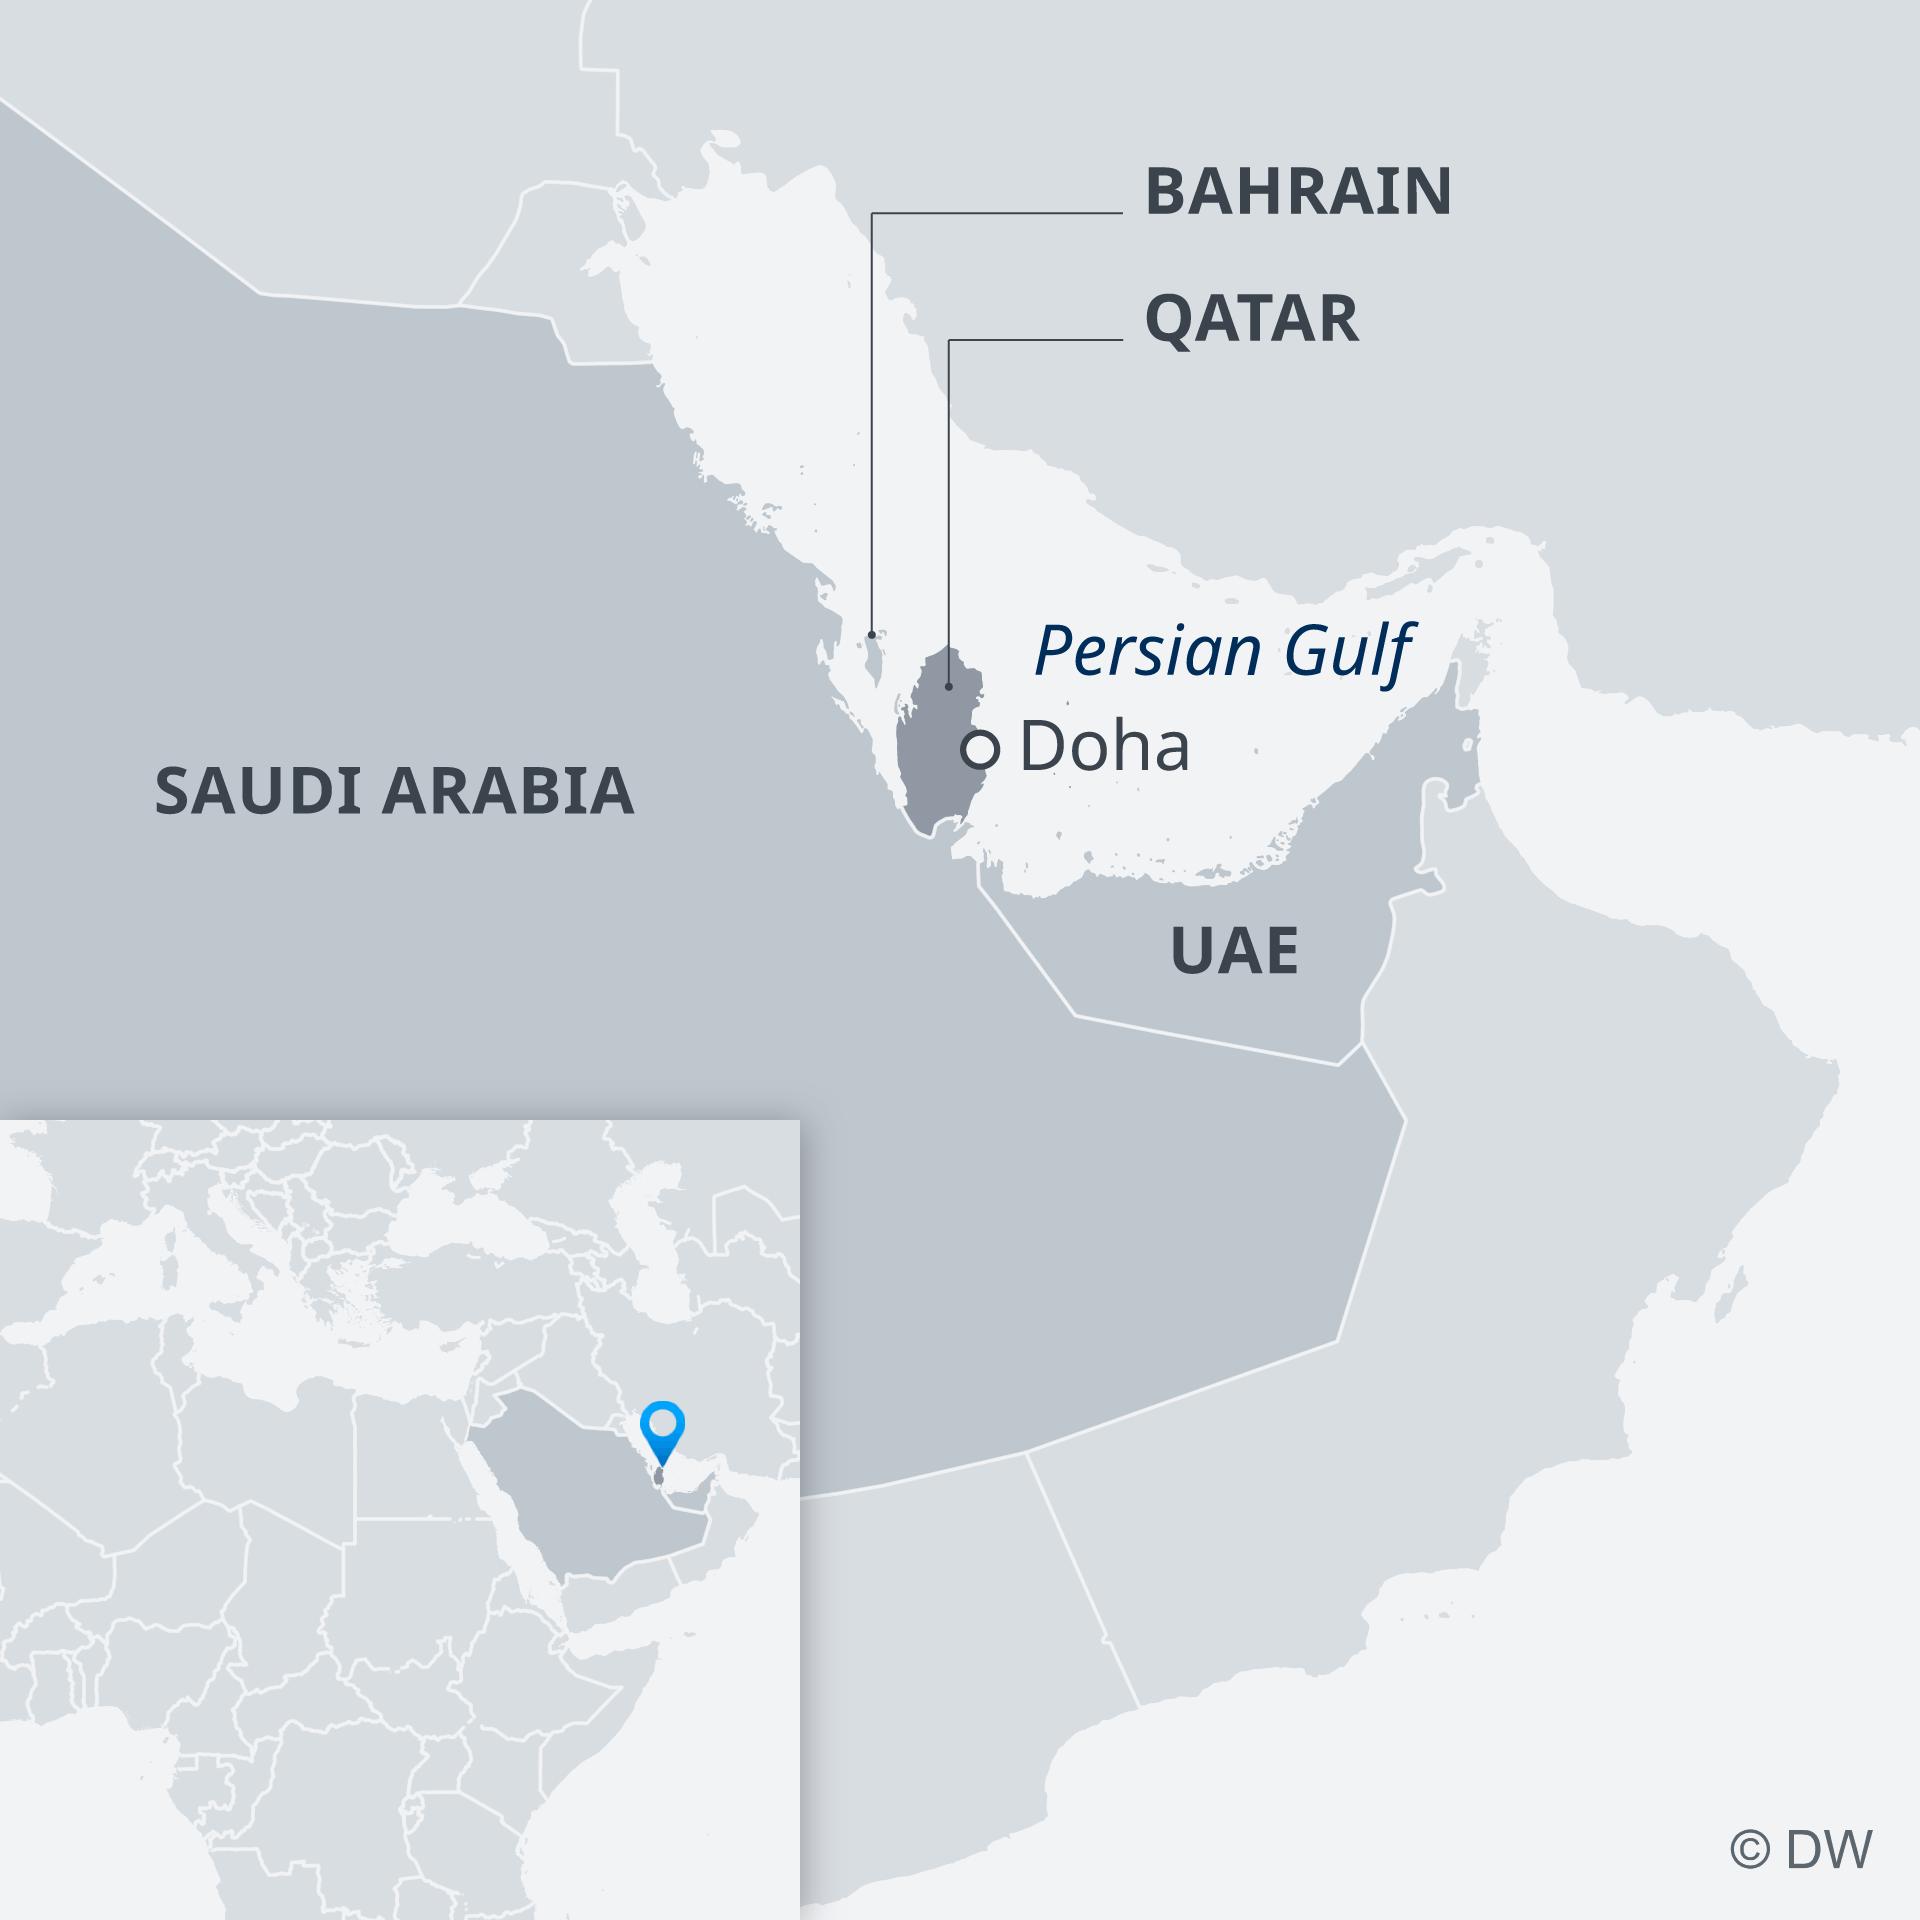 A map showing Saudi Arabia, Bahrain, Qatar and the UAE